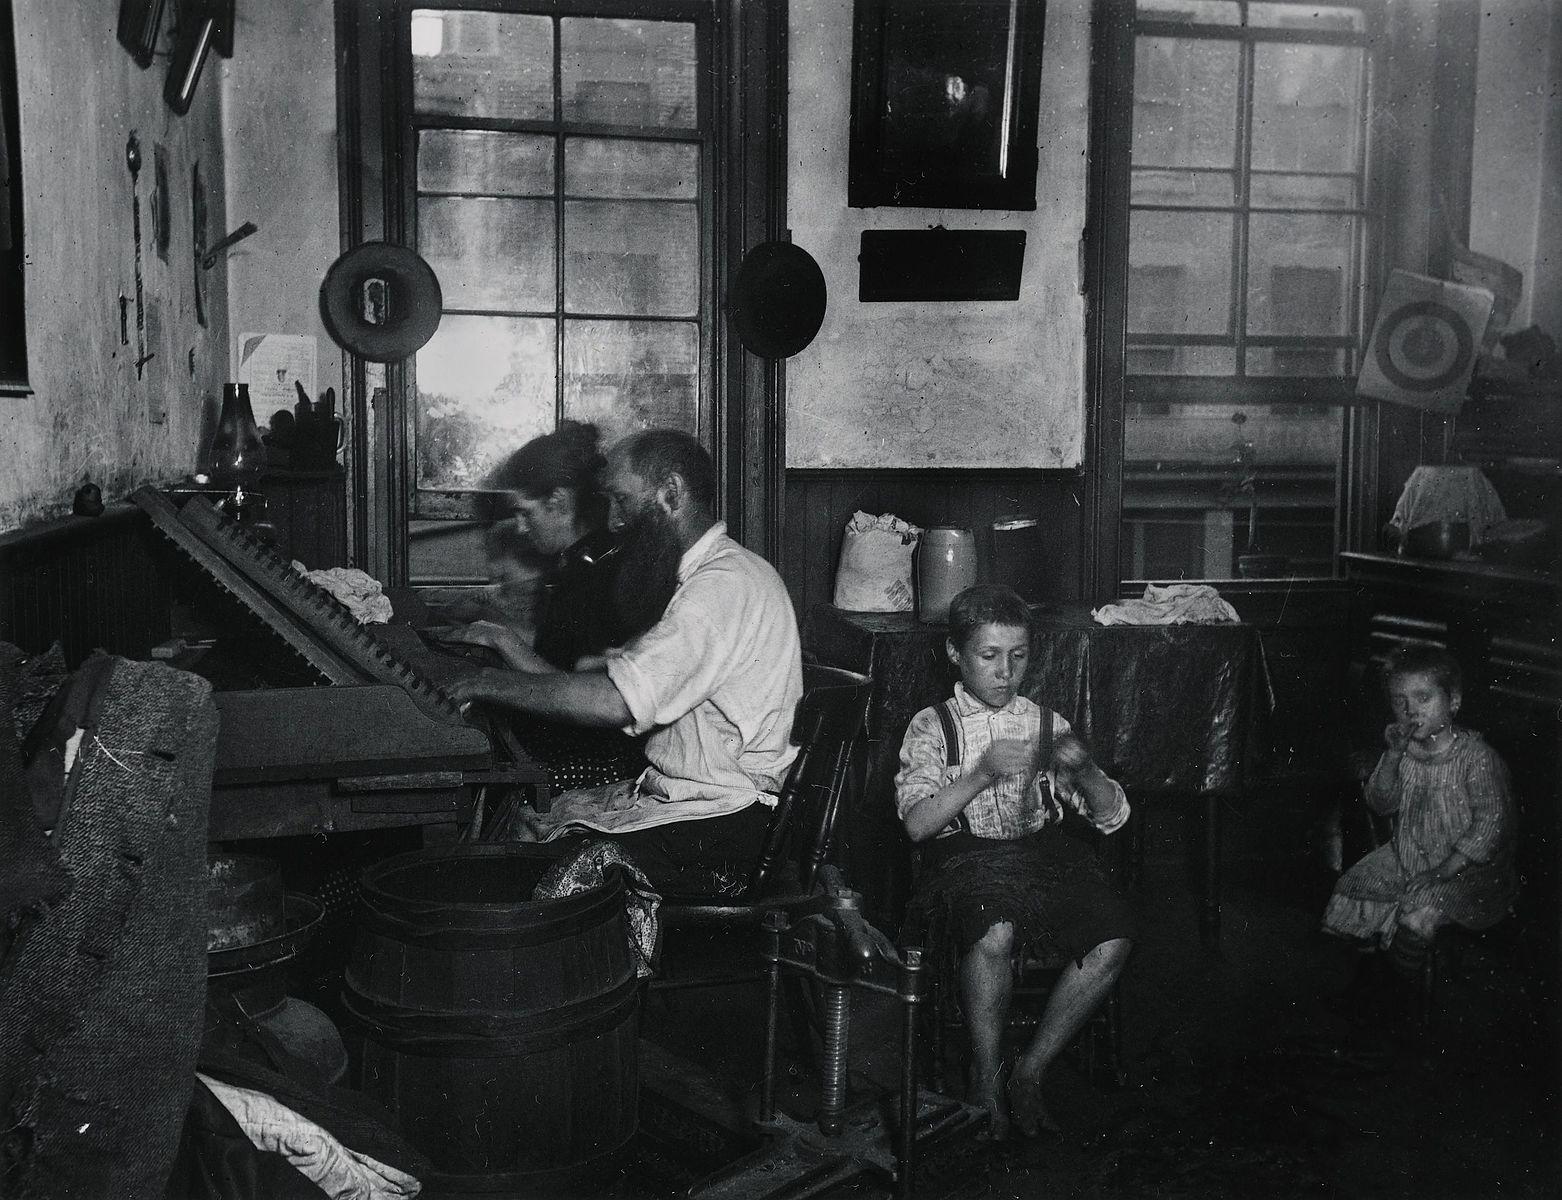 _Bohemian_Cigarmakers_at_work_in_their_Tenement__(5389942068).jpg